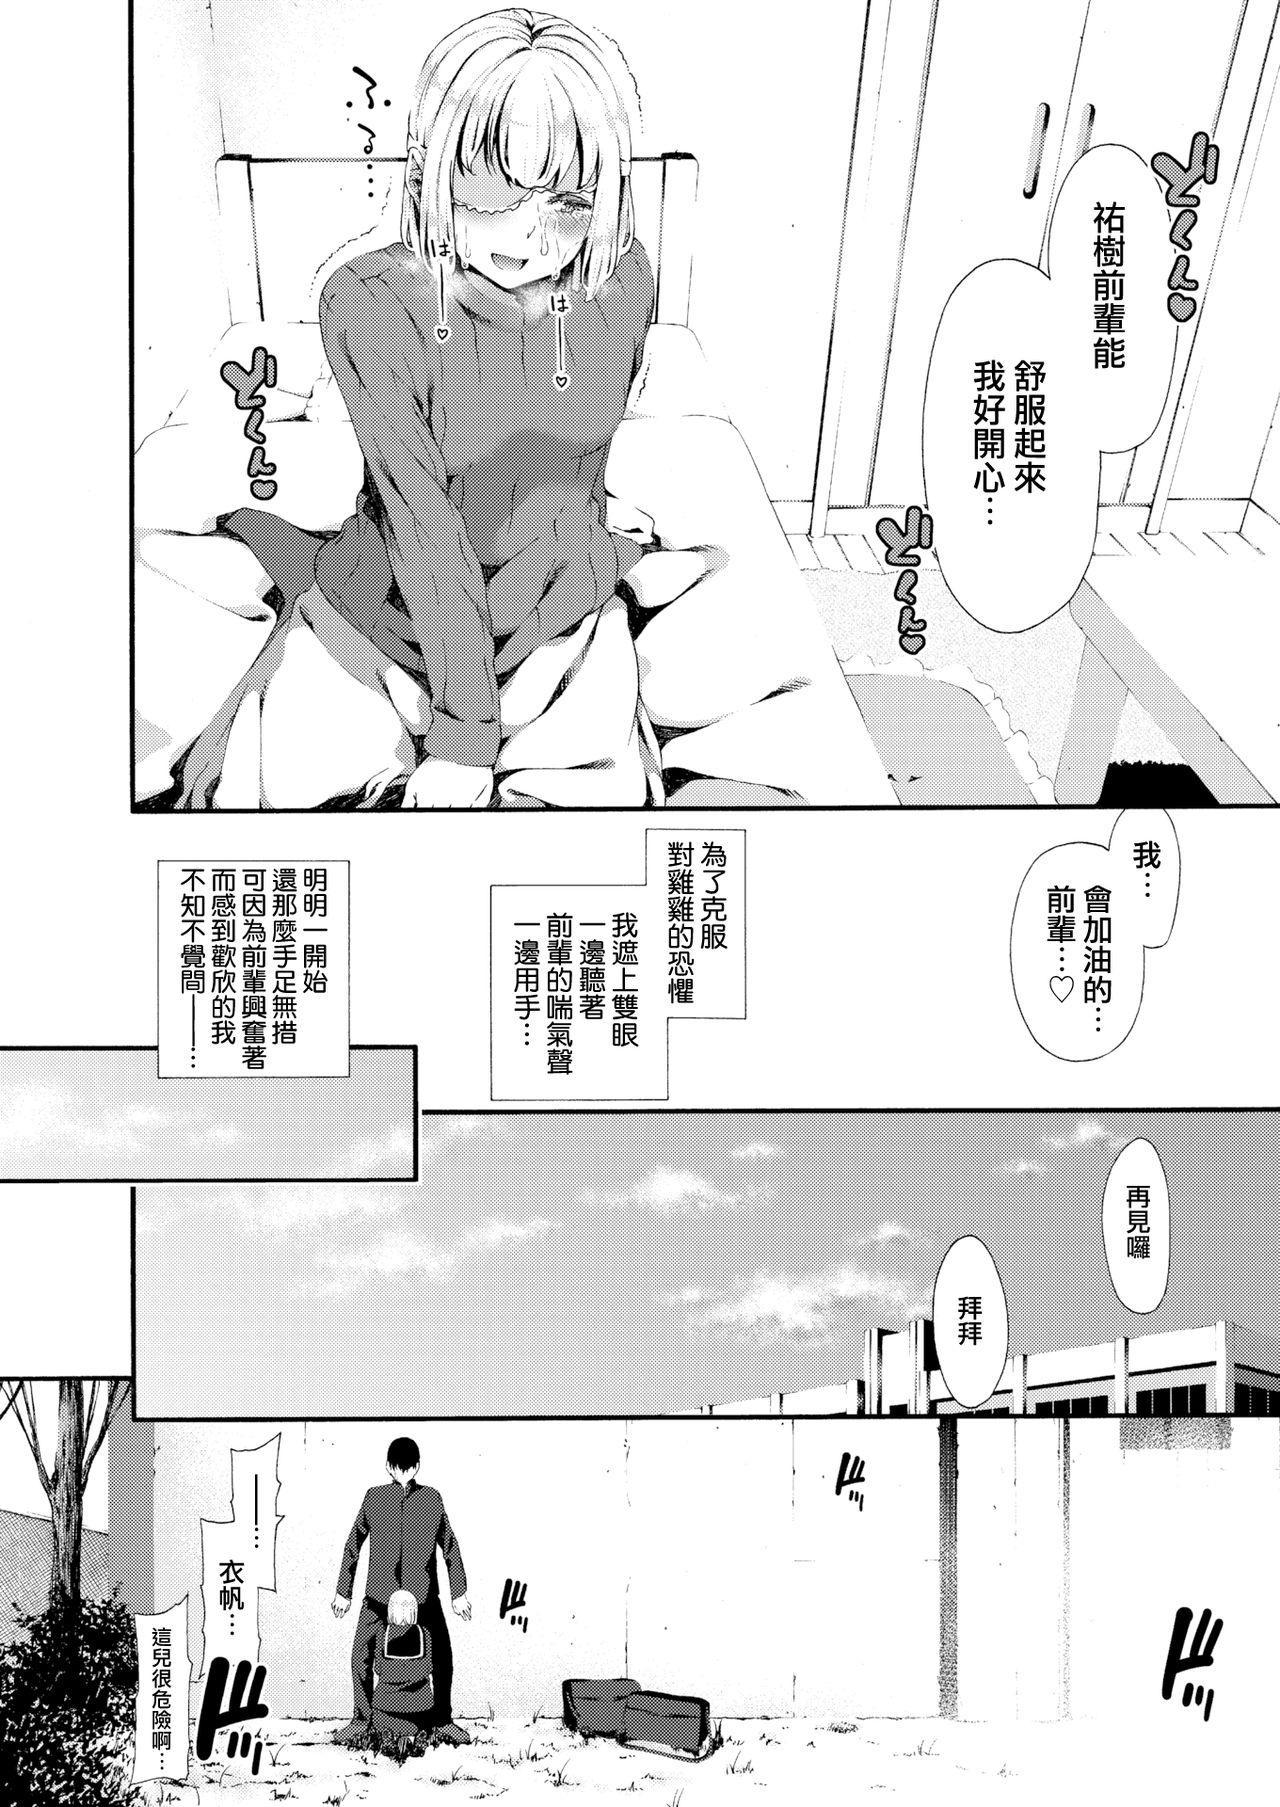 [Izure] Iho-chan no Jijou - Ihochan no situation. (COMIC X-EROS #63) [Chinese] [無邪気漢化組] [Digital] 9